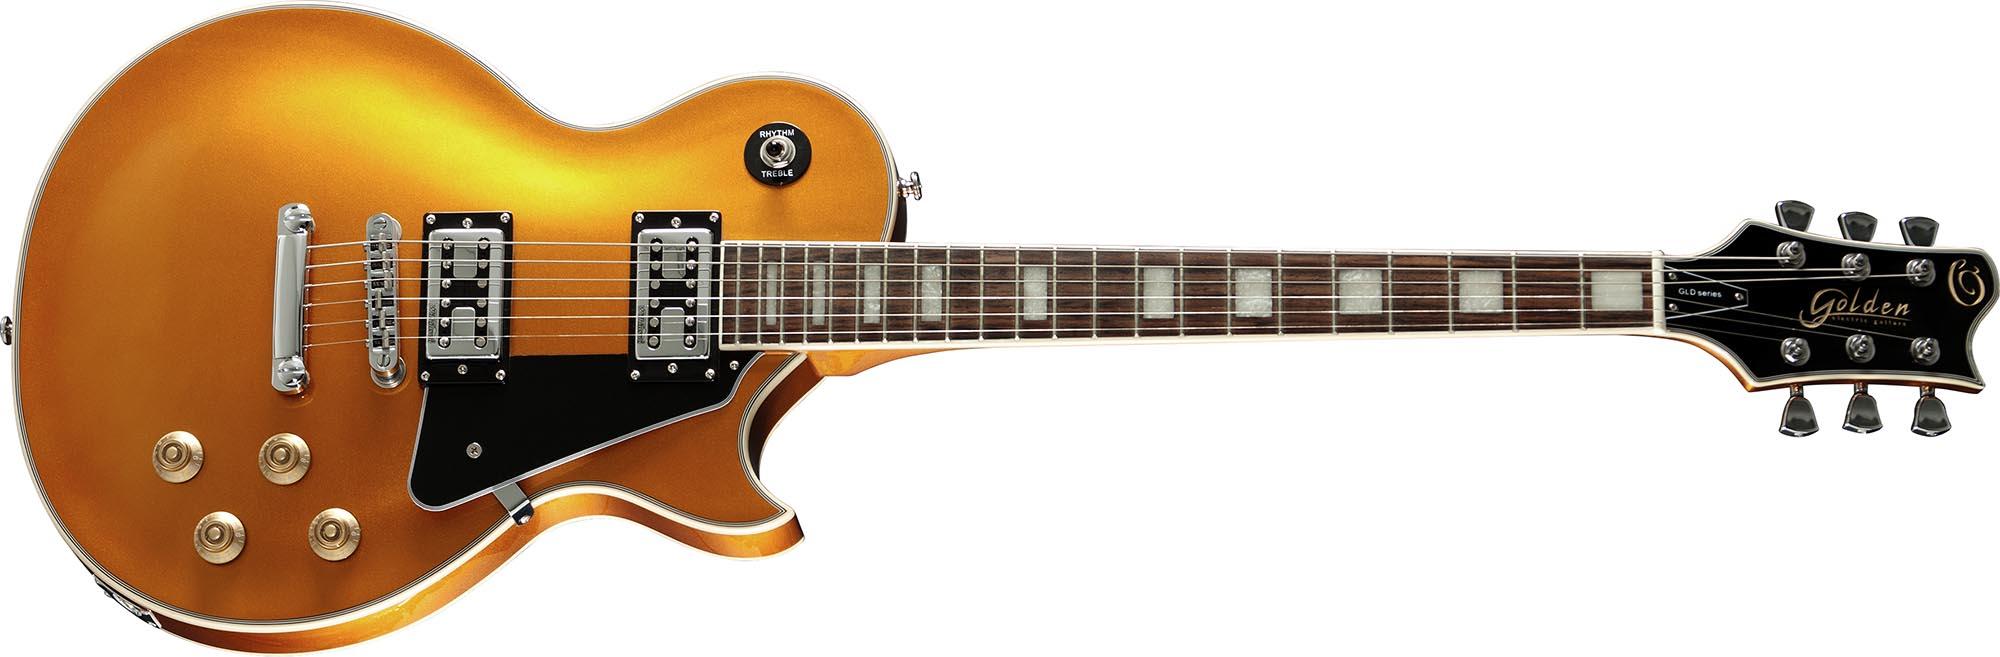 gld152c guitarra eletrica les paul golden gld152c gld goldtop dourada visao frontal